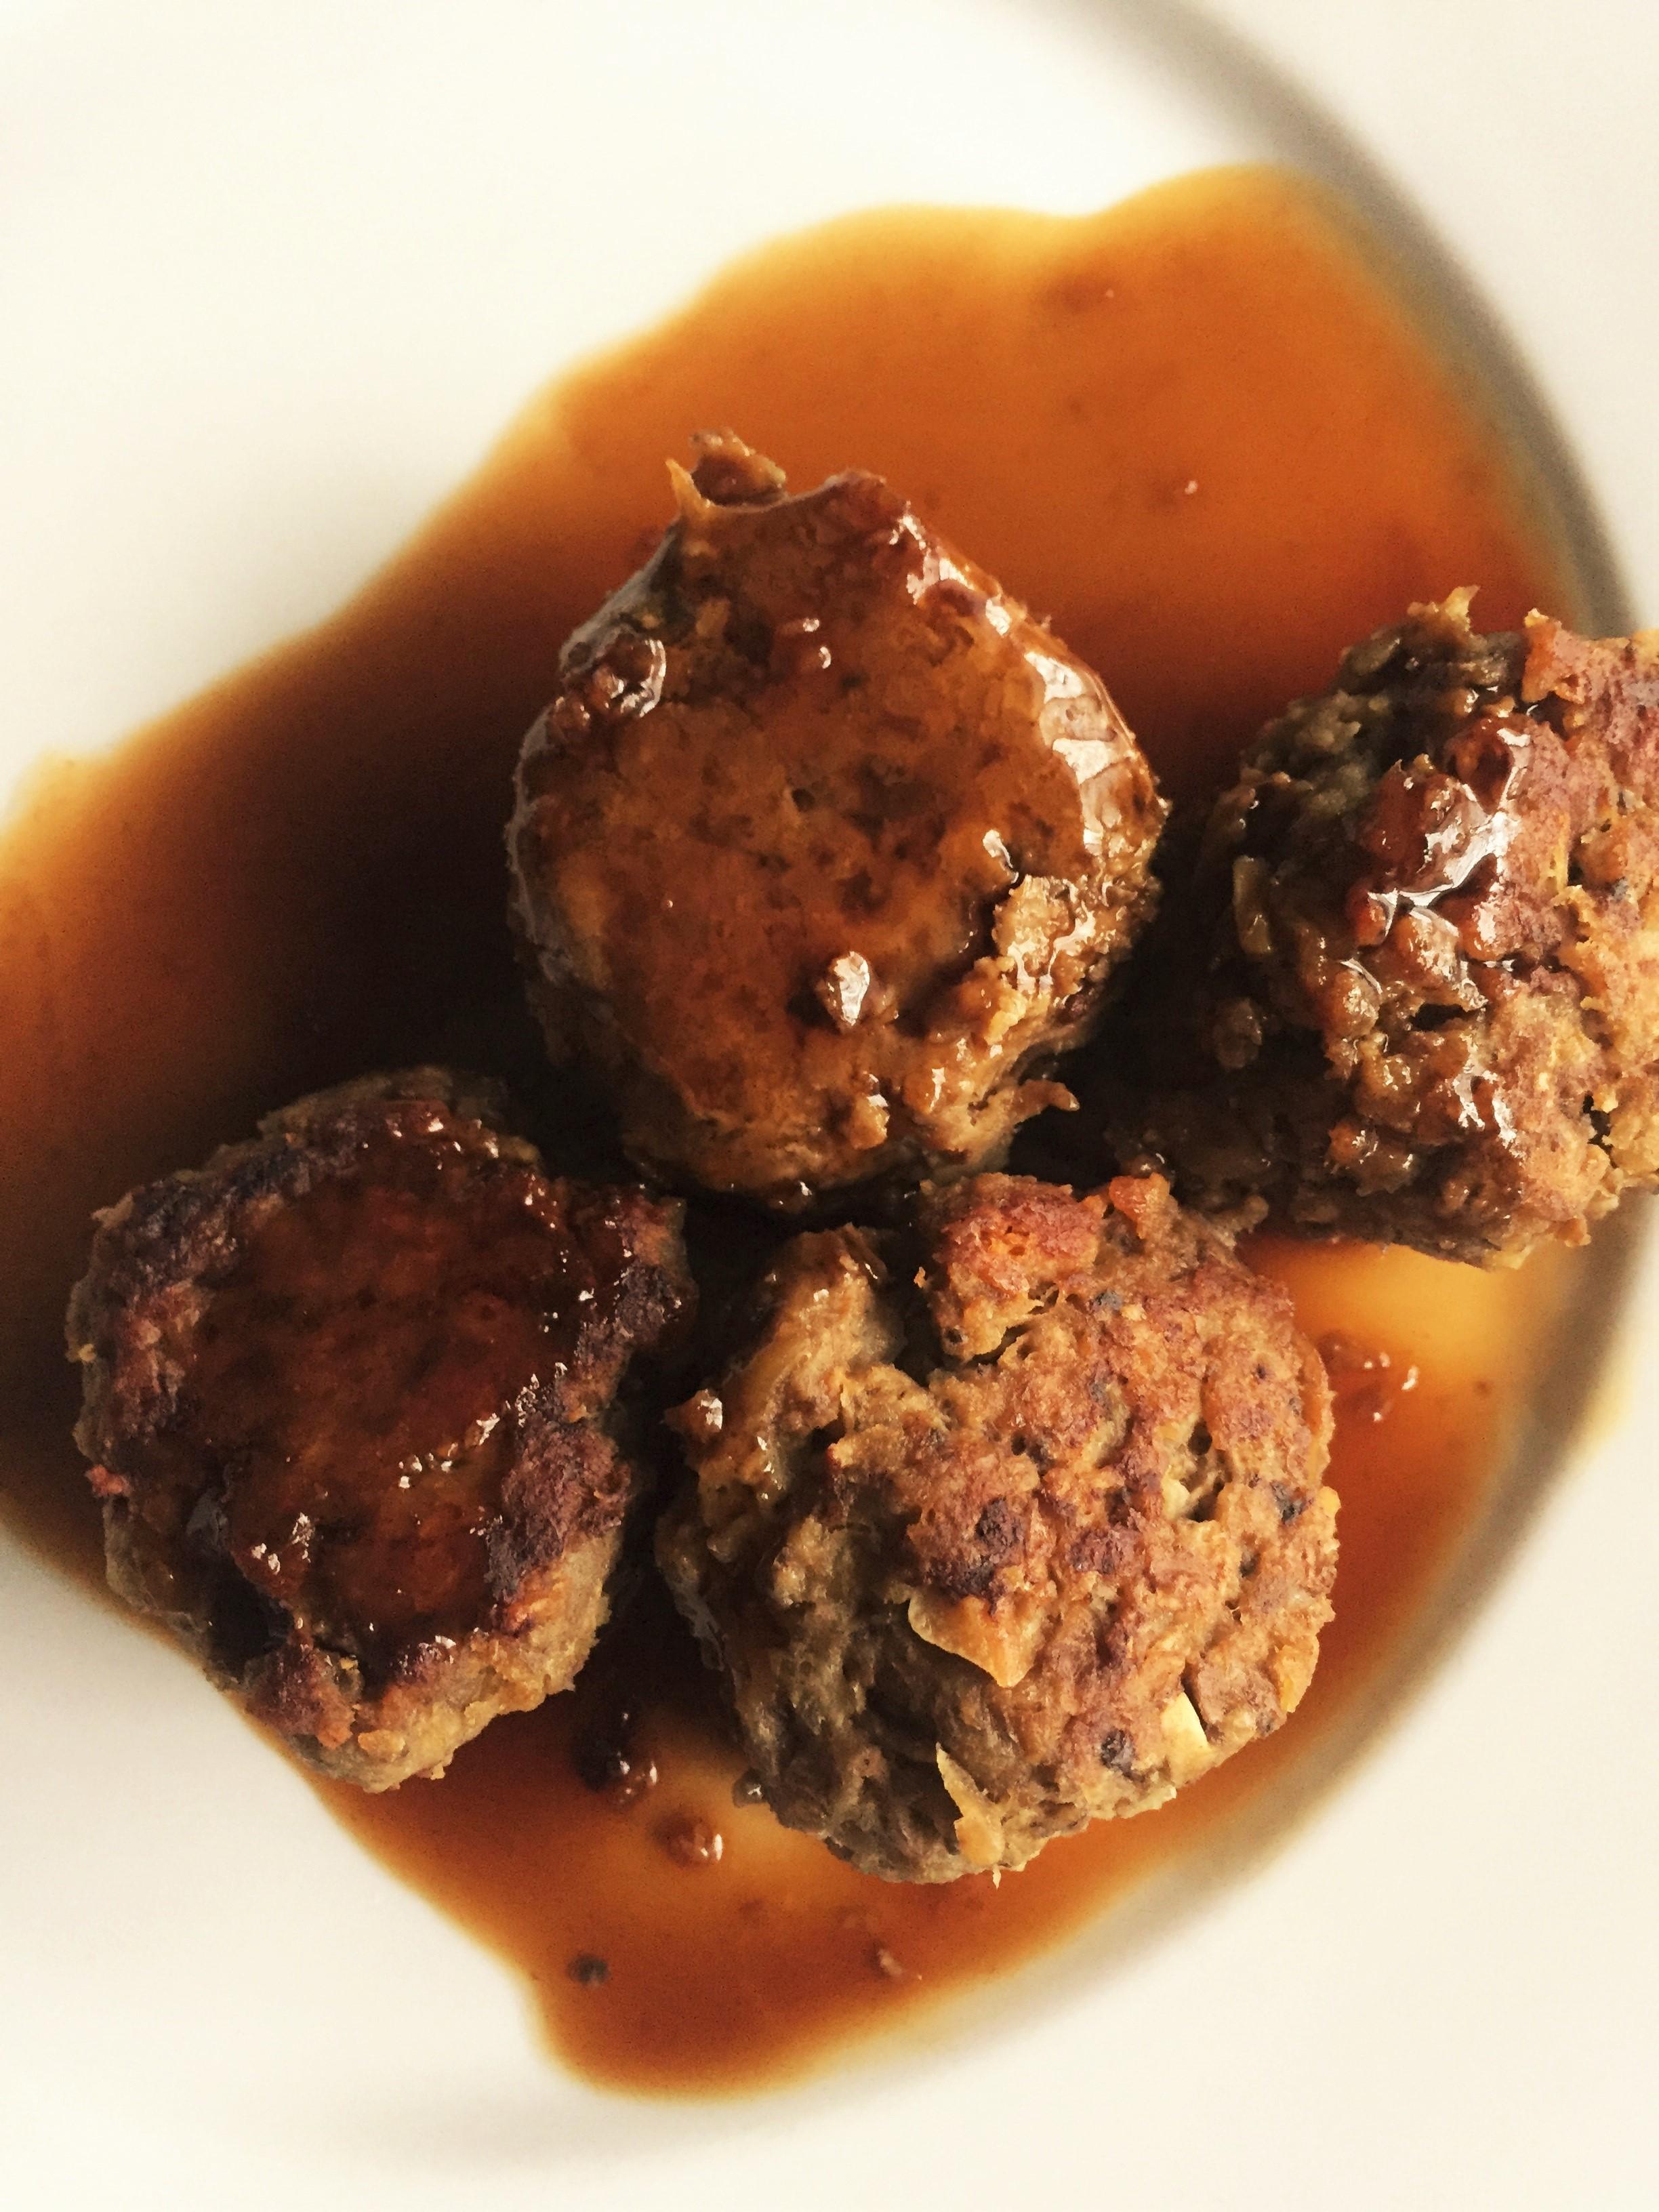 Same meatballs with Honey Garlic Sauce